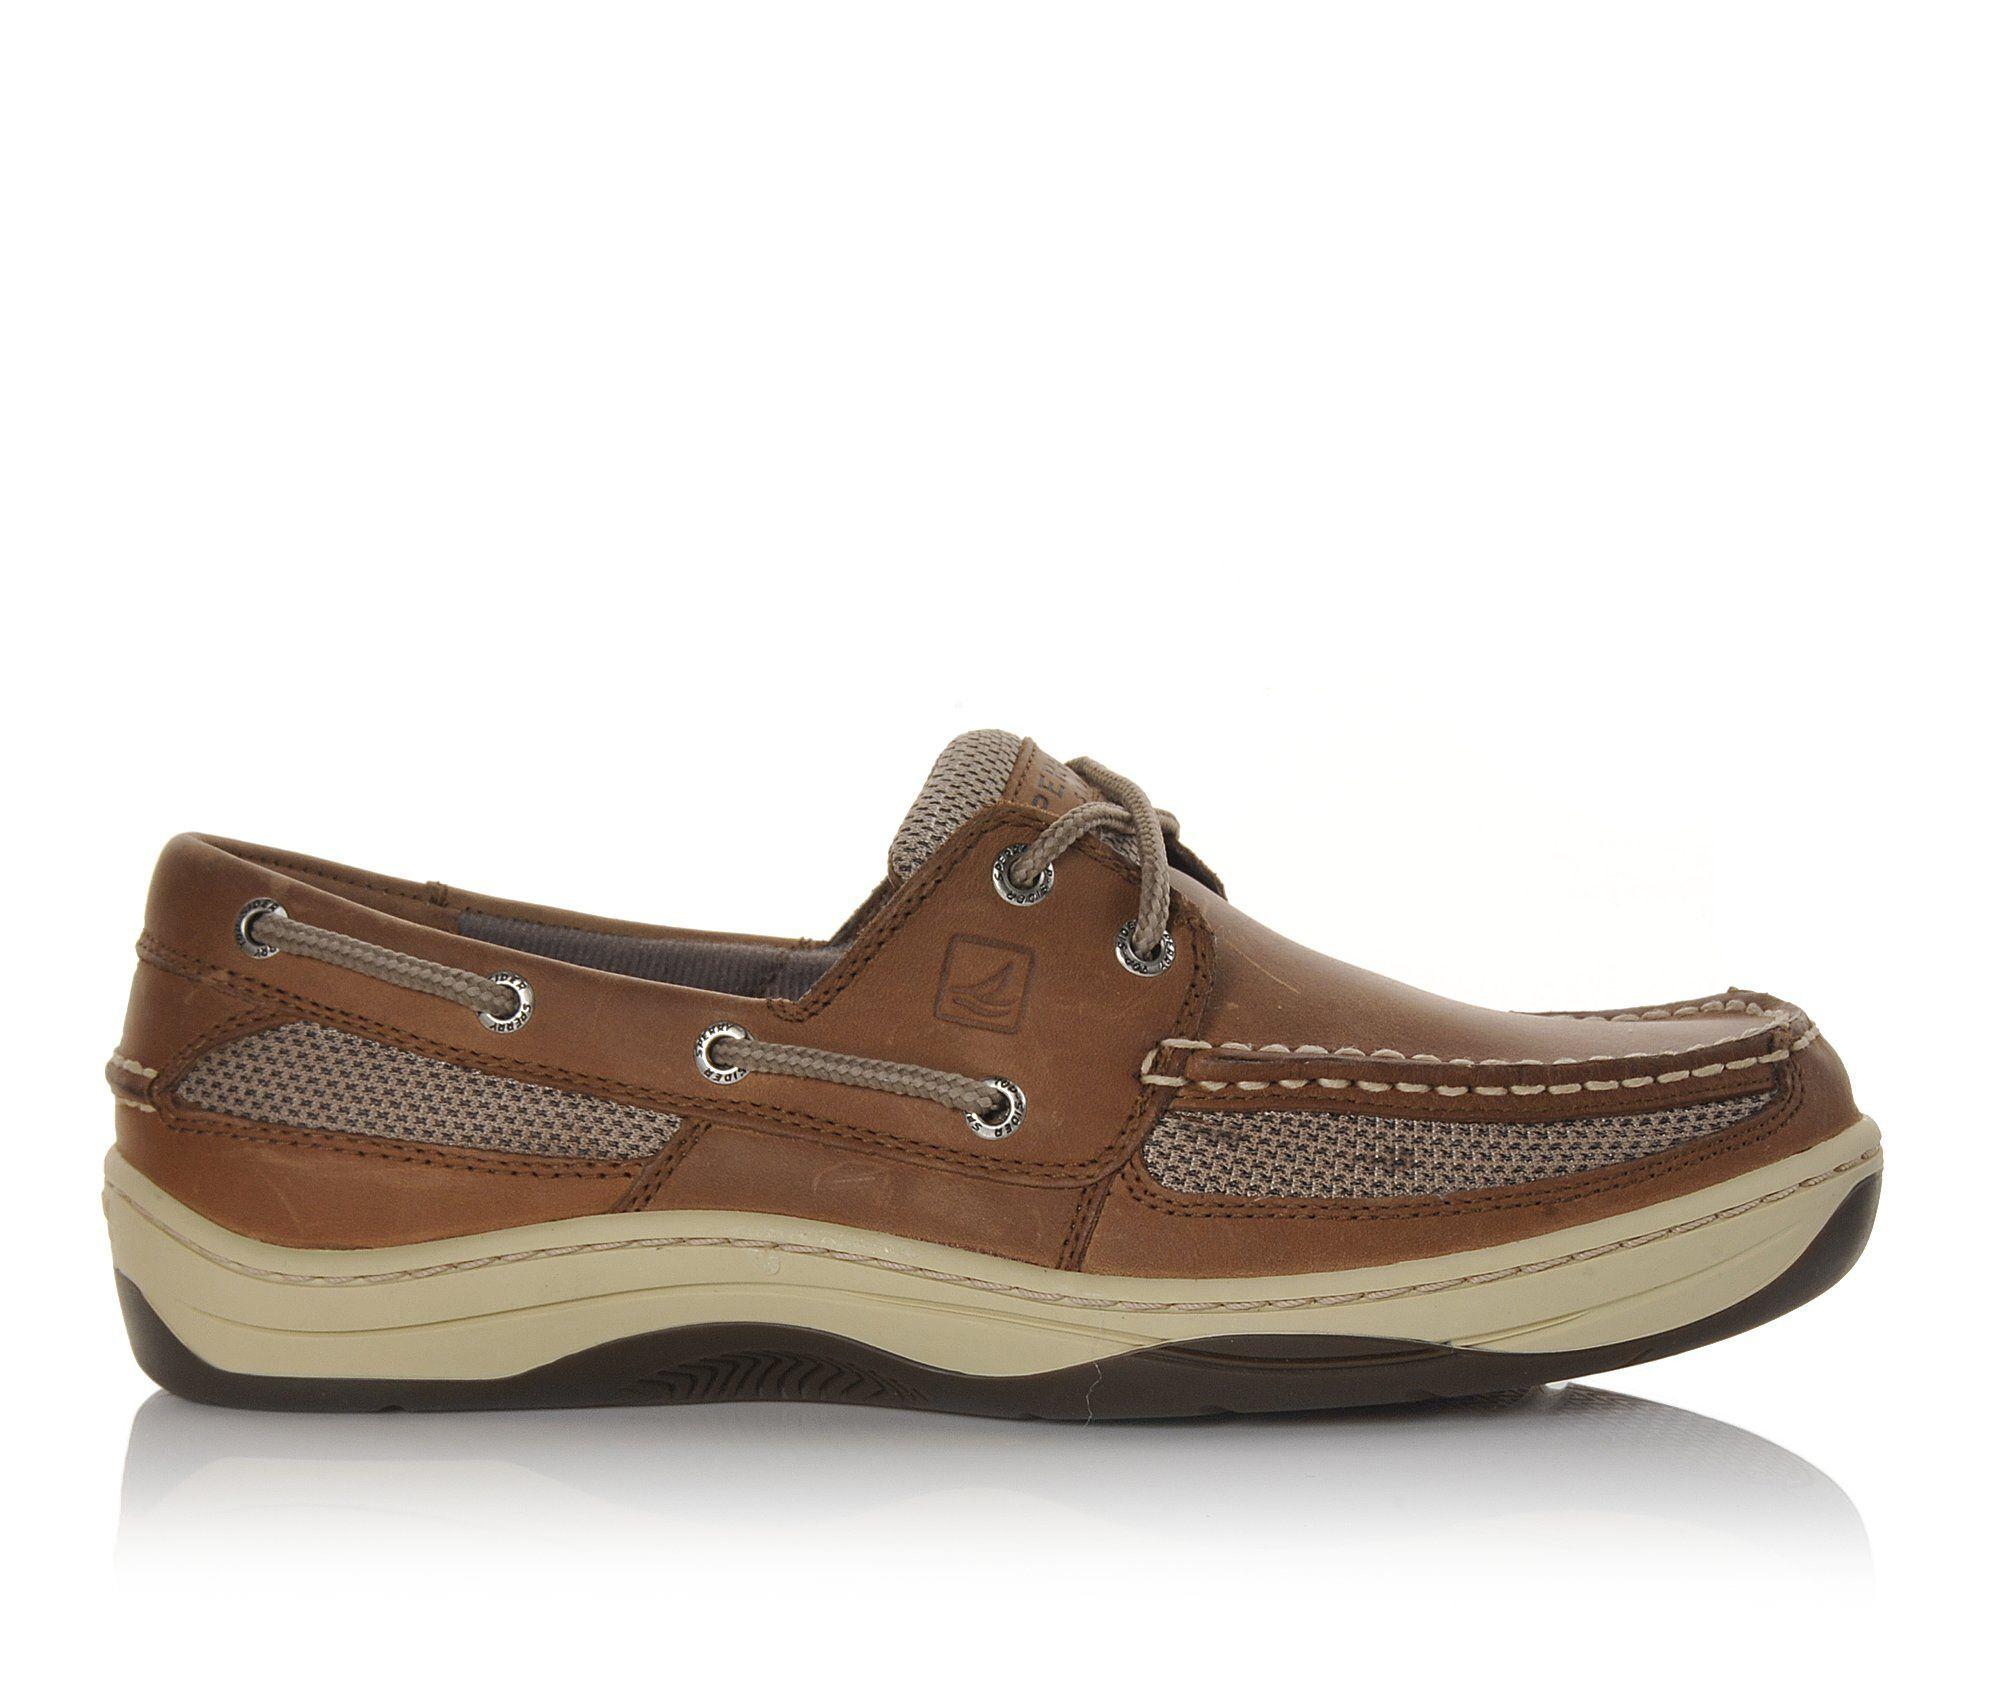 Men's Sperry Tarpon 2 Eye Boat Shoes Dk. Tan Leather